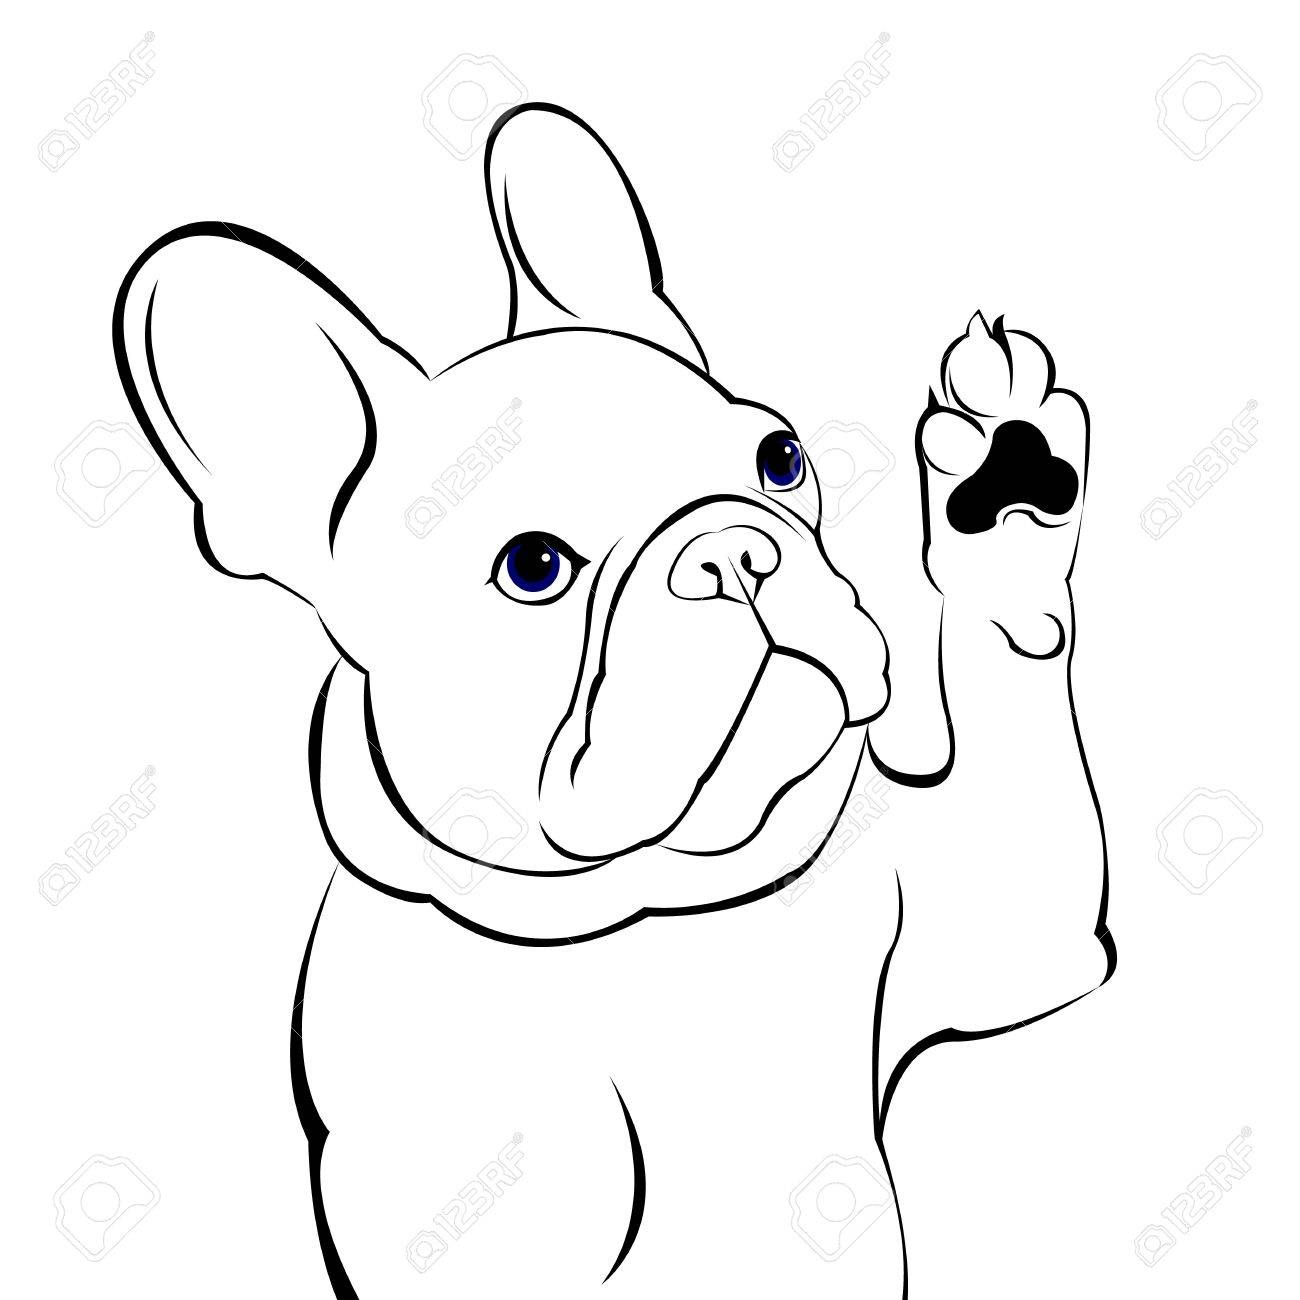 1300x1300 Dog, Vector, Breed, Cute, Pet, Animal, Bulldog, French, French